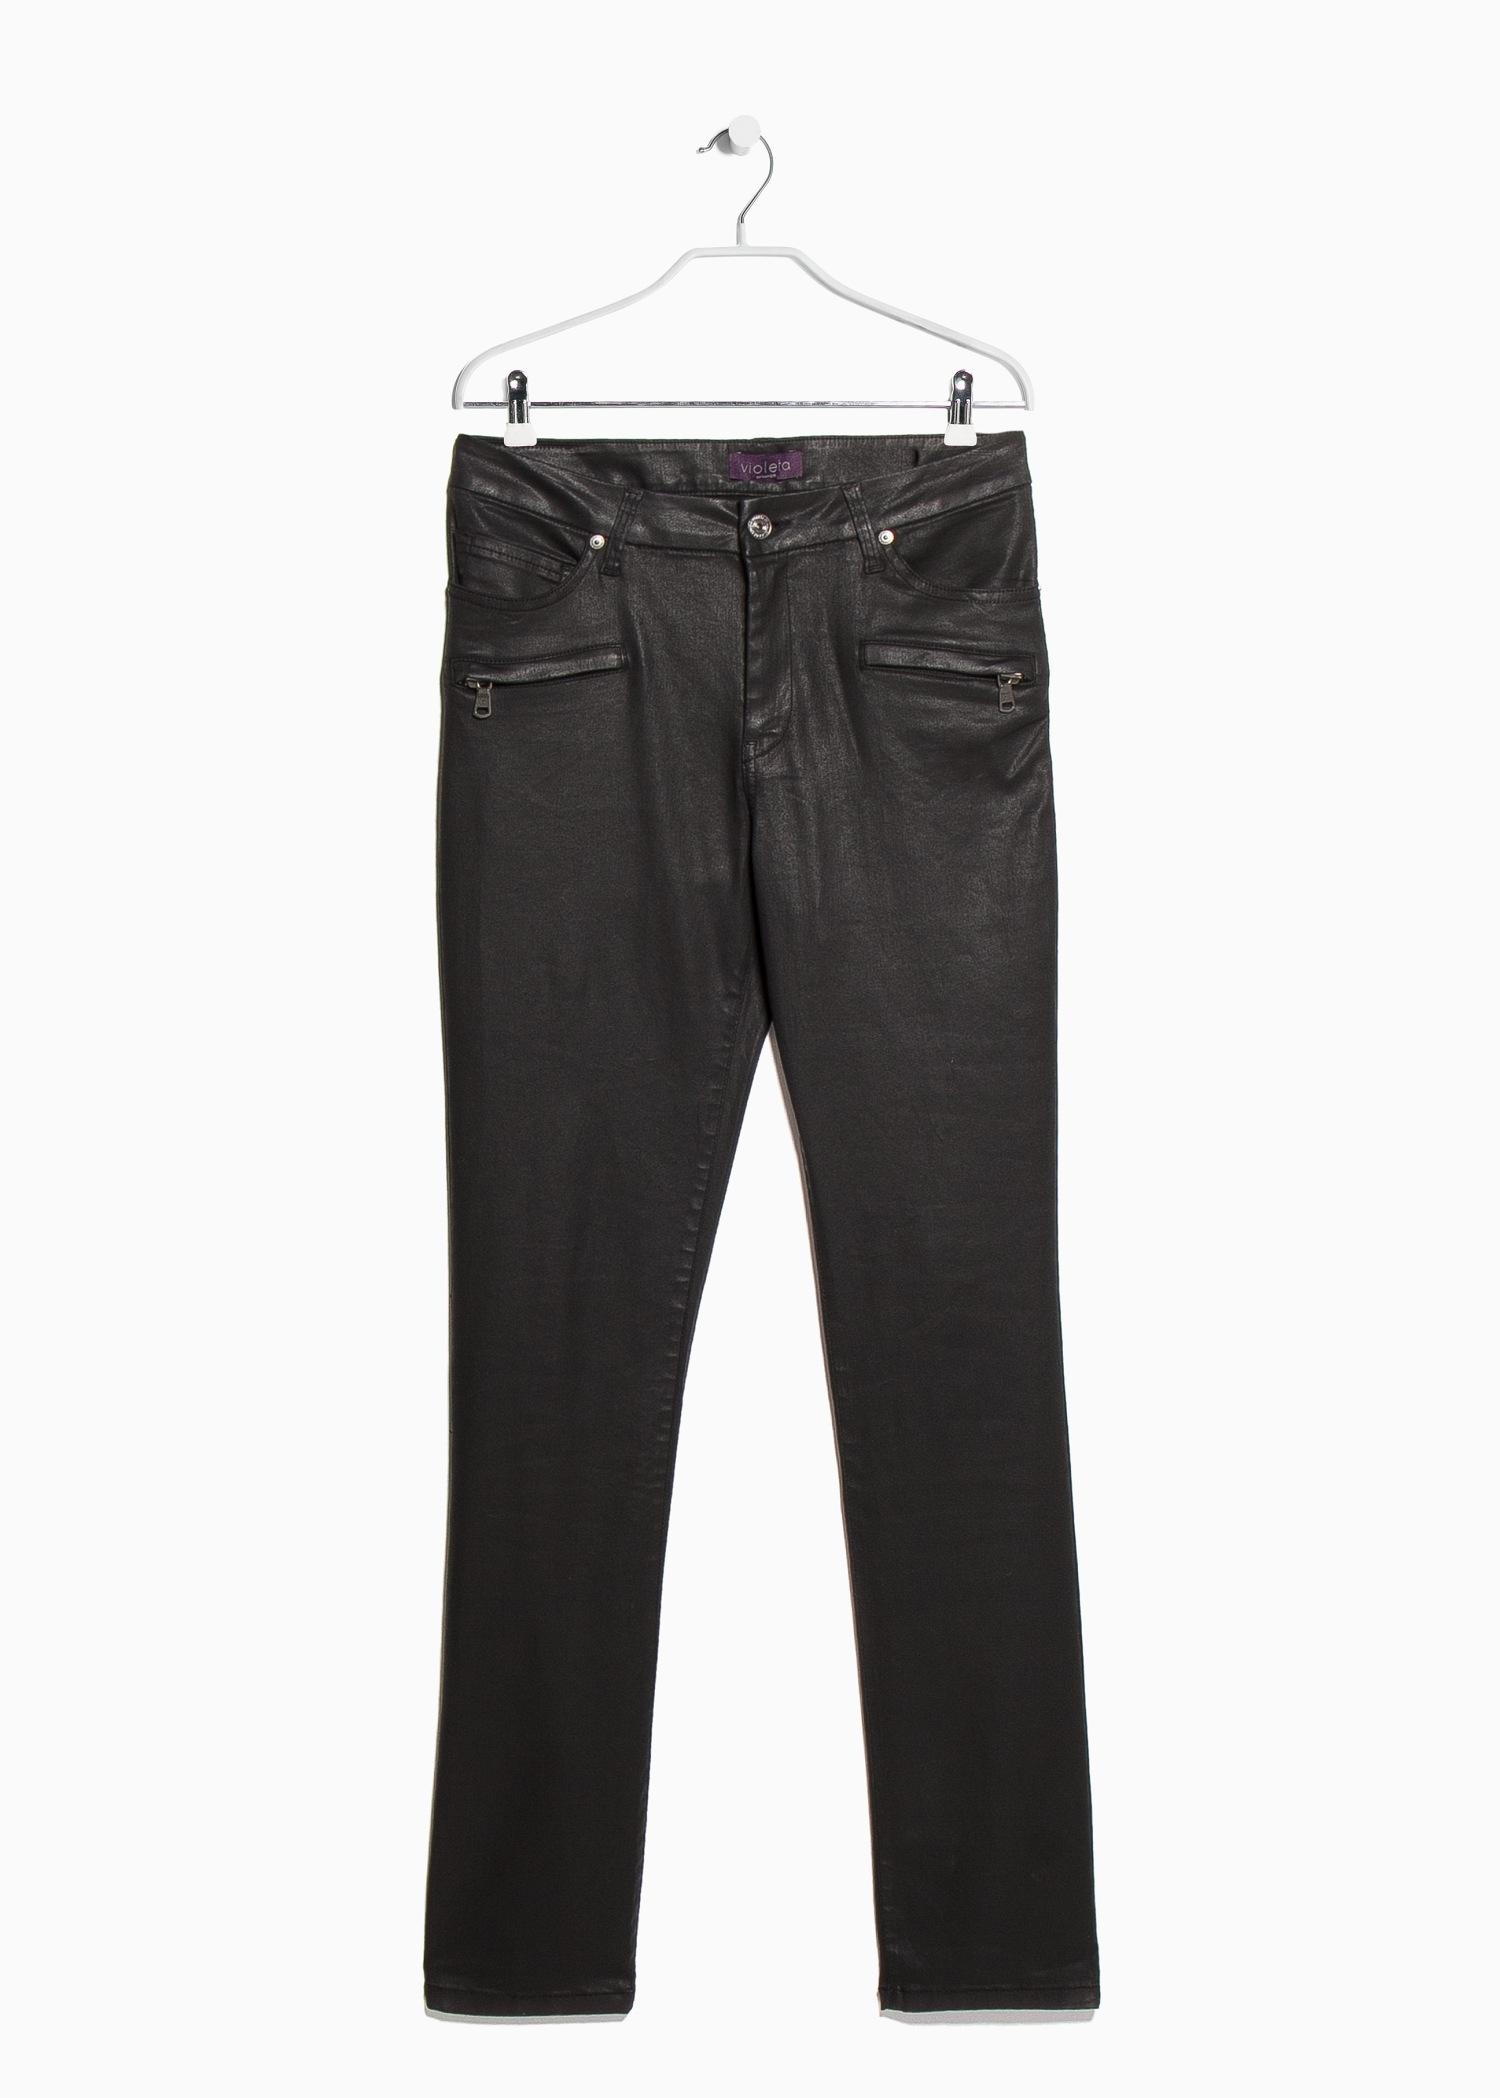 c4d0b752e Violeta by Mango Coated Slim-Fit Carmen Jeans in Black - Lyst